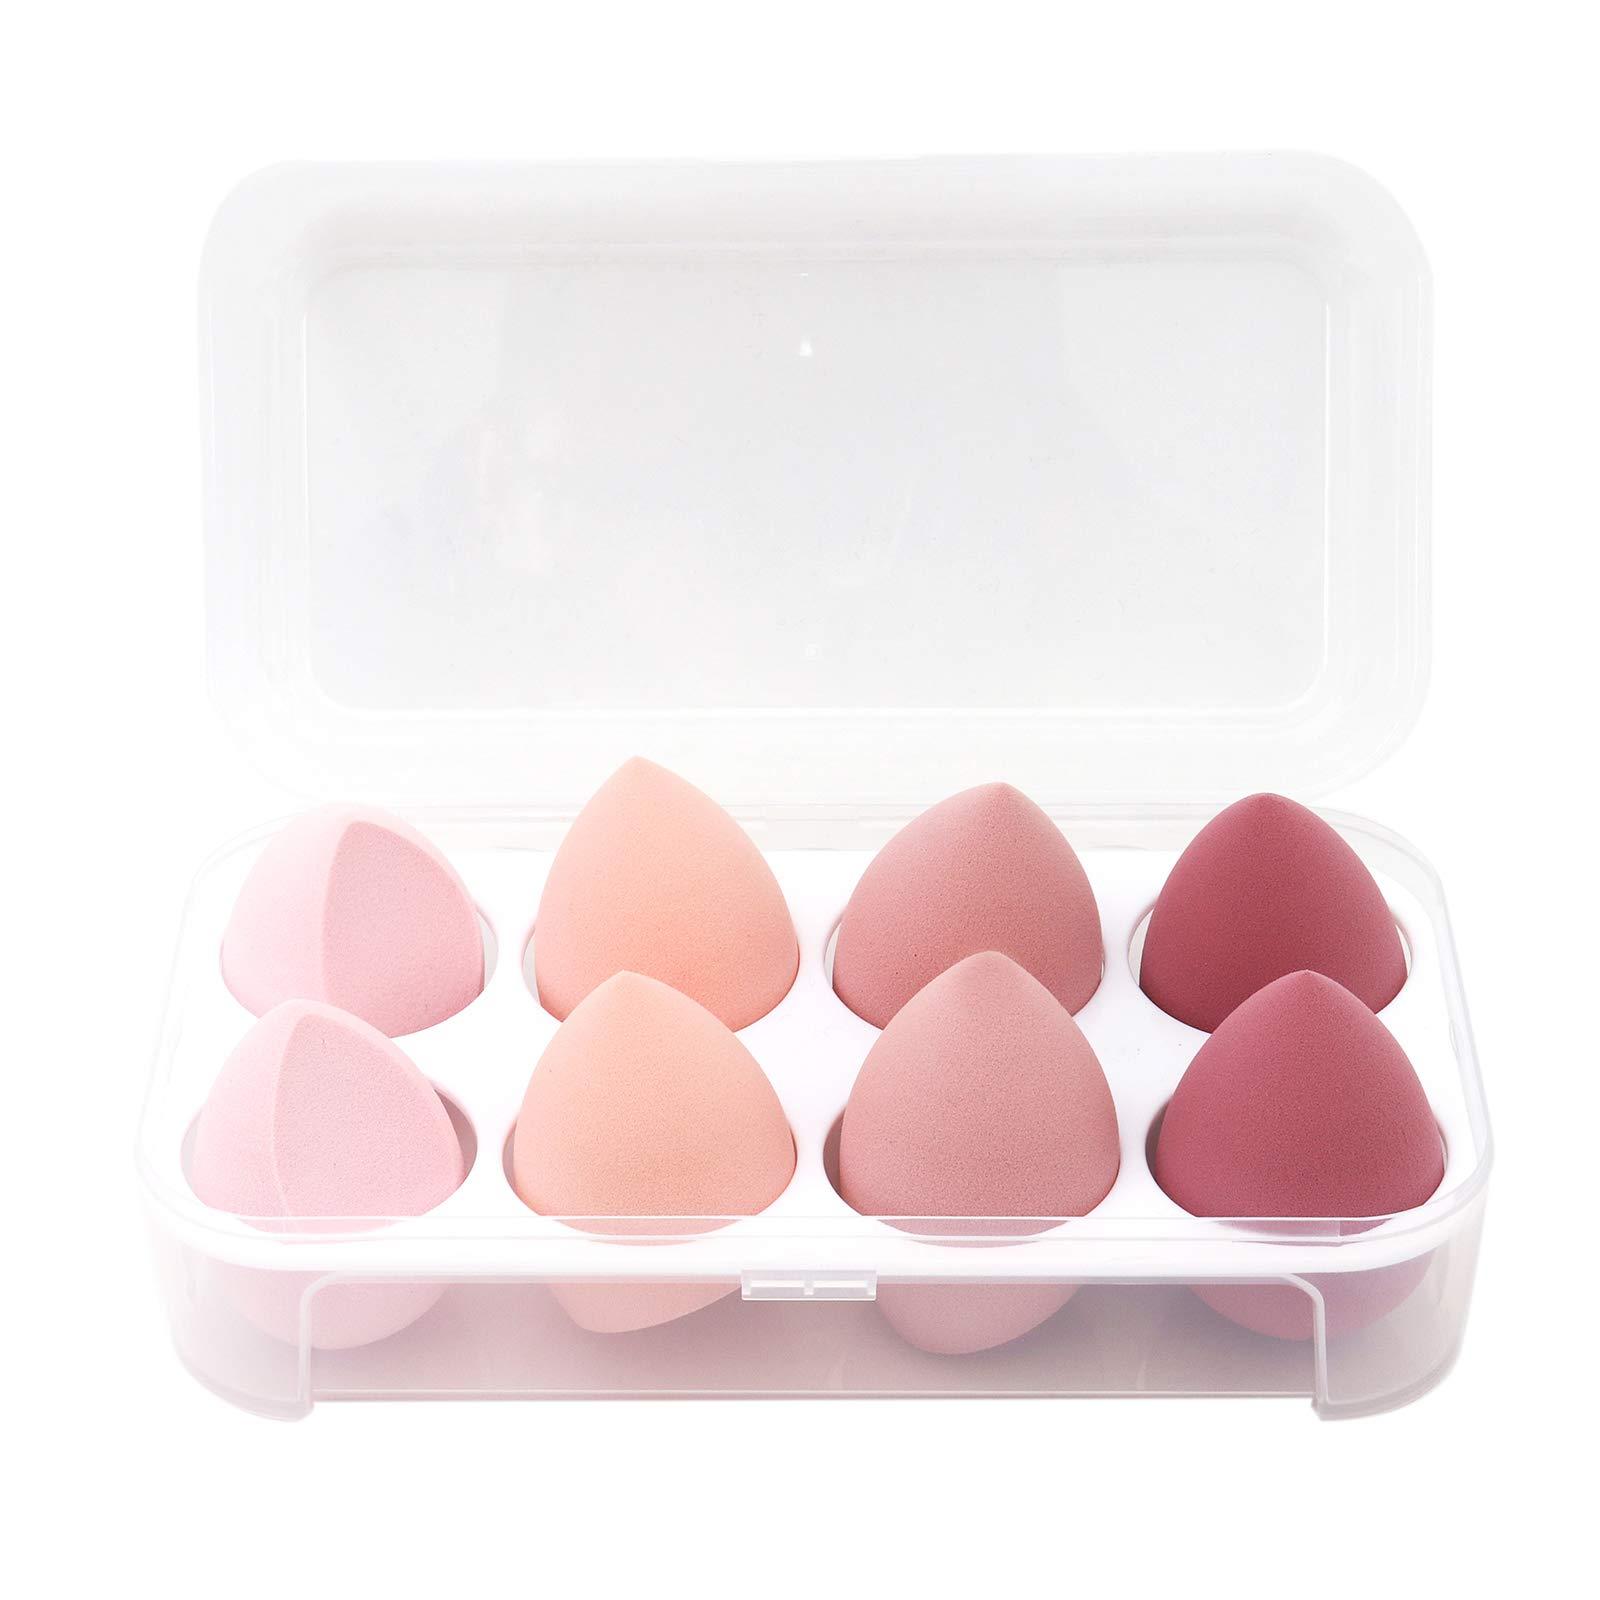 8 PCS Makeup Sponge Set Makeup Sponges Blender Latex-Free Vegan Beauty Sponge Makeup Egg Foundation Blending Cosmetic Makeup Puff for Powder Cream (Pink)